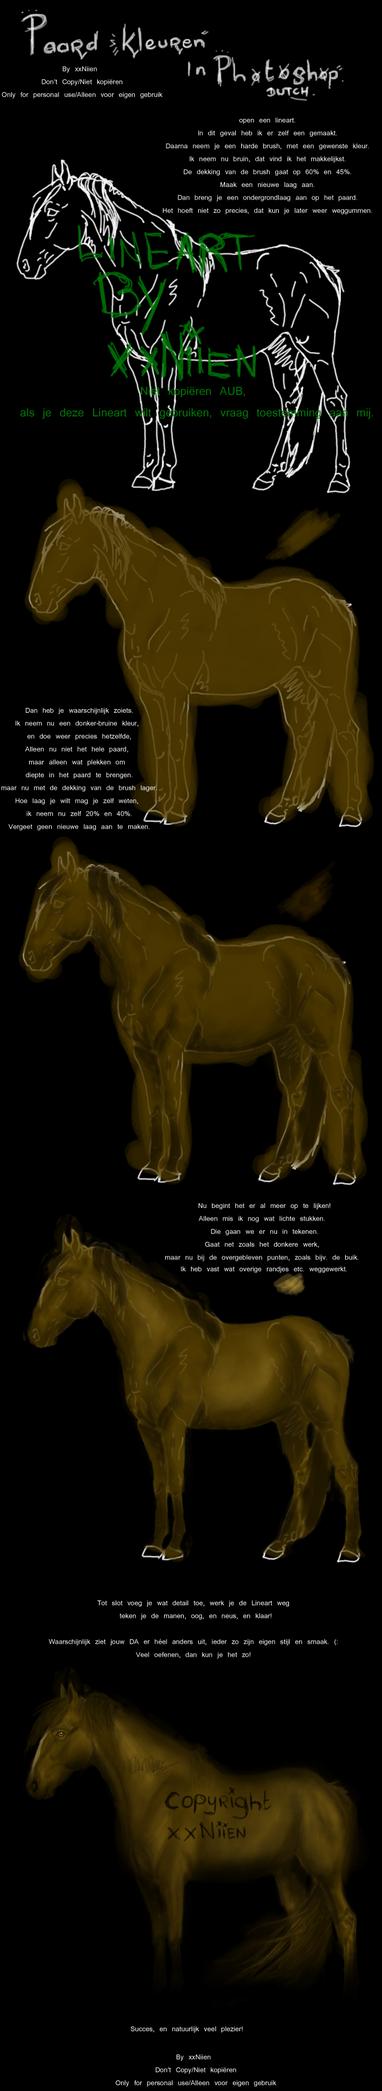 How to draw a horse - DUTCH by xxNiien